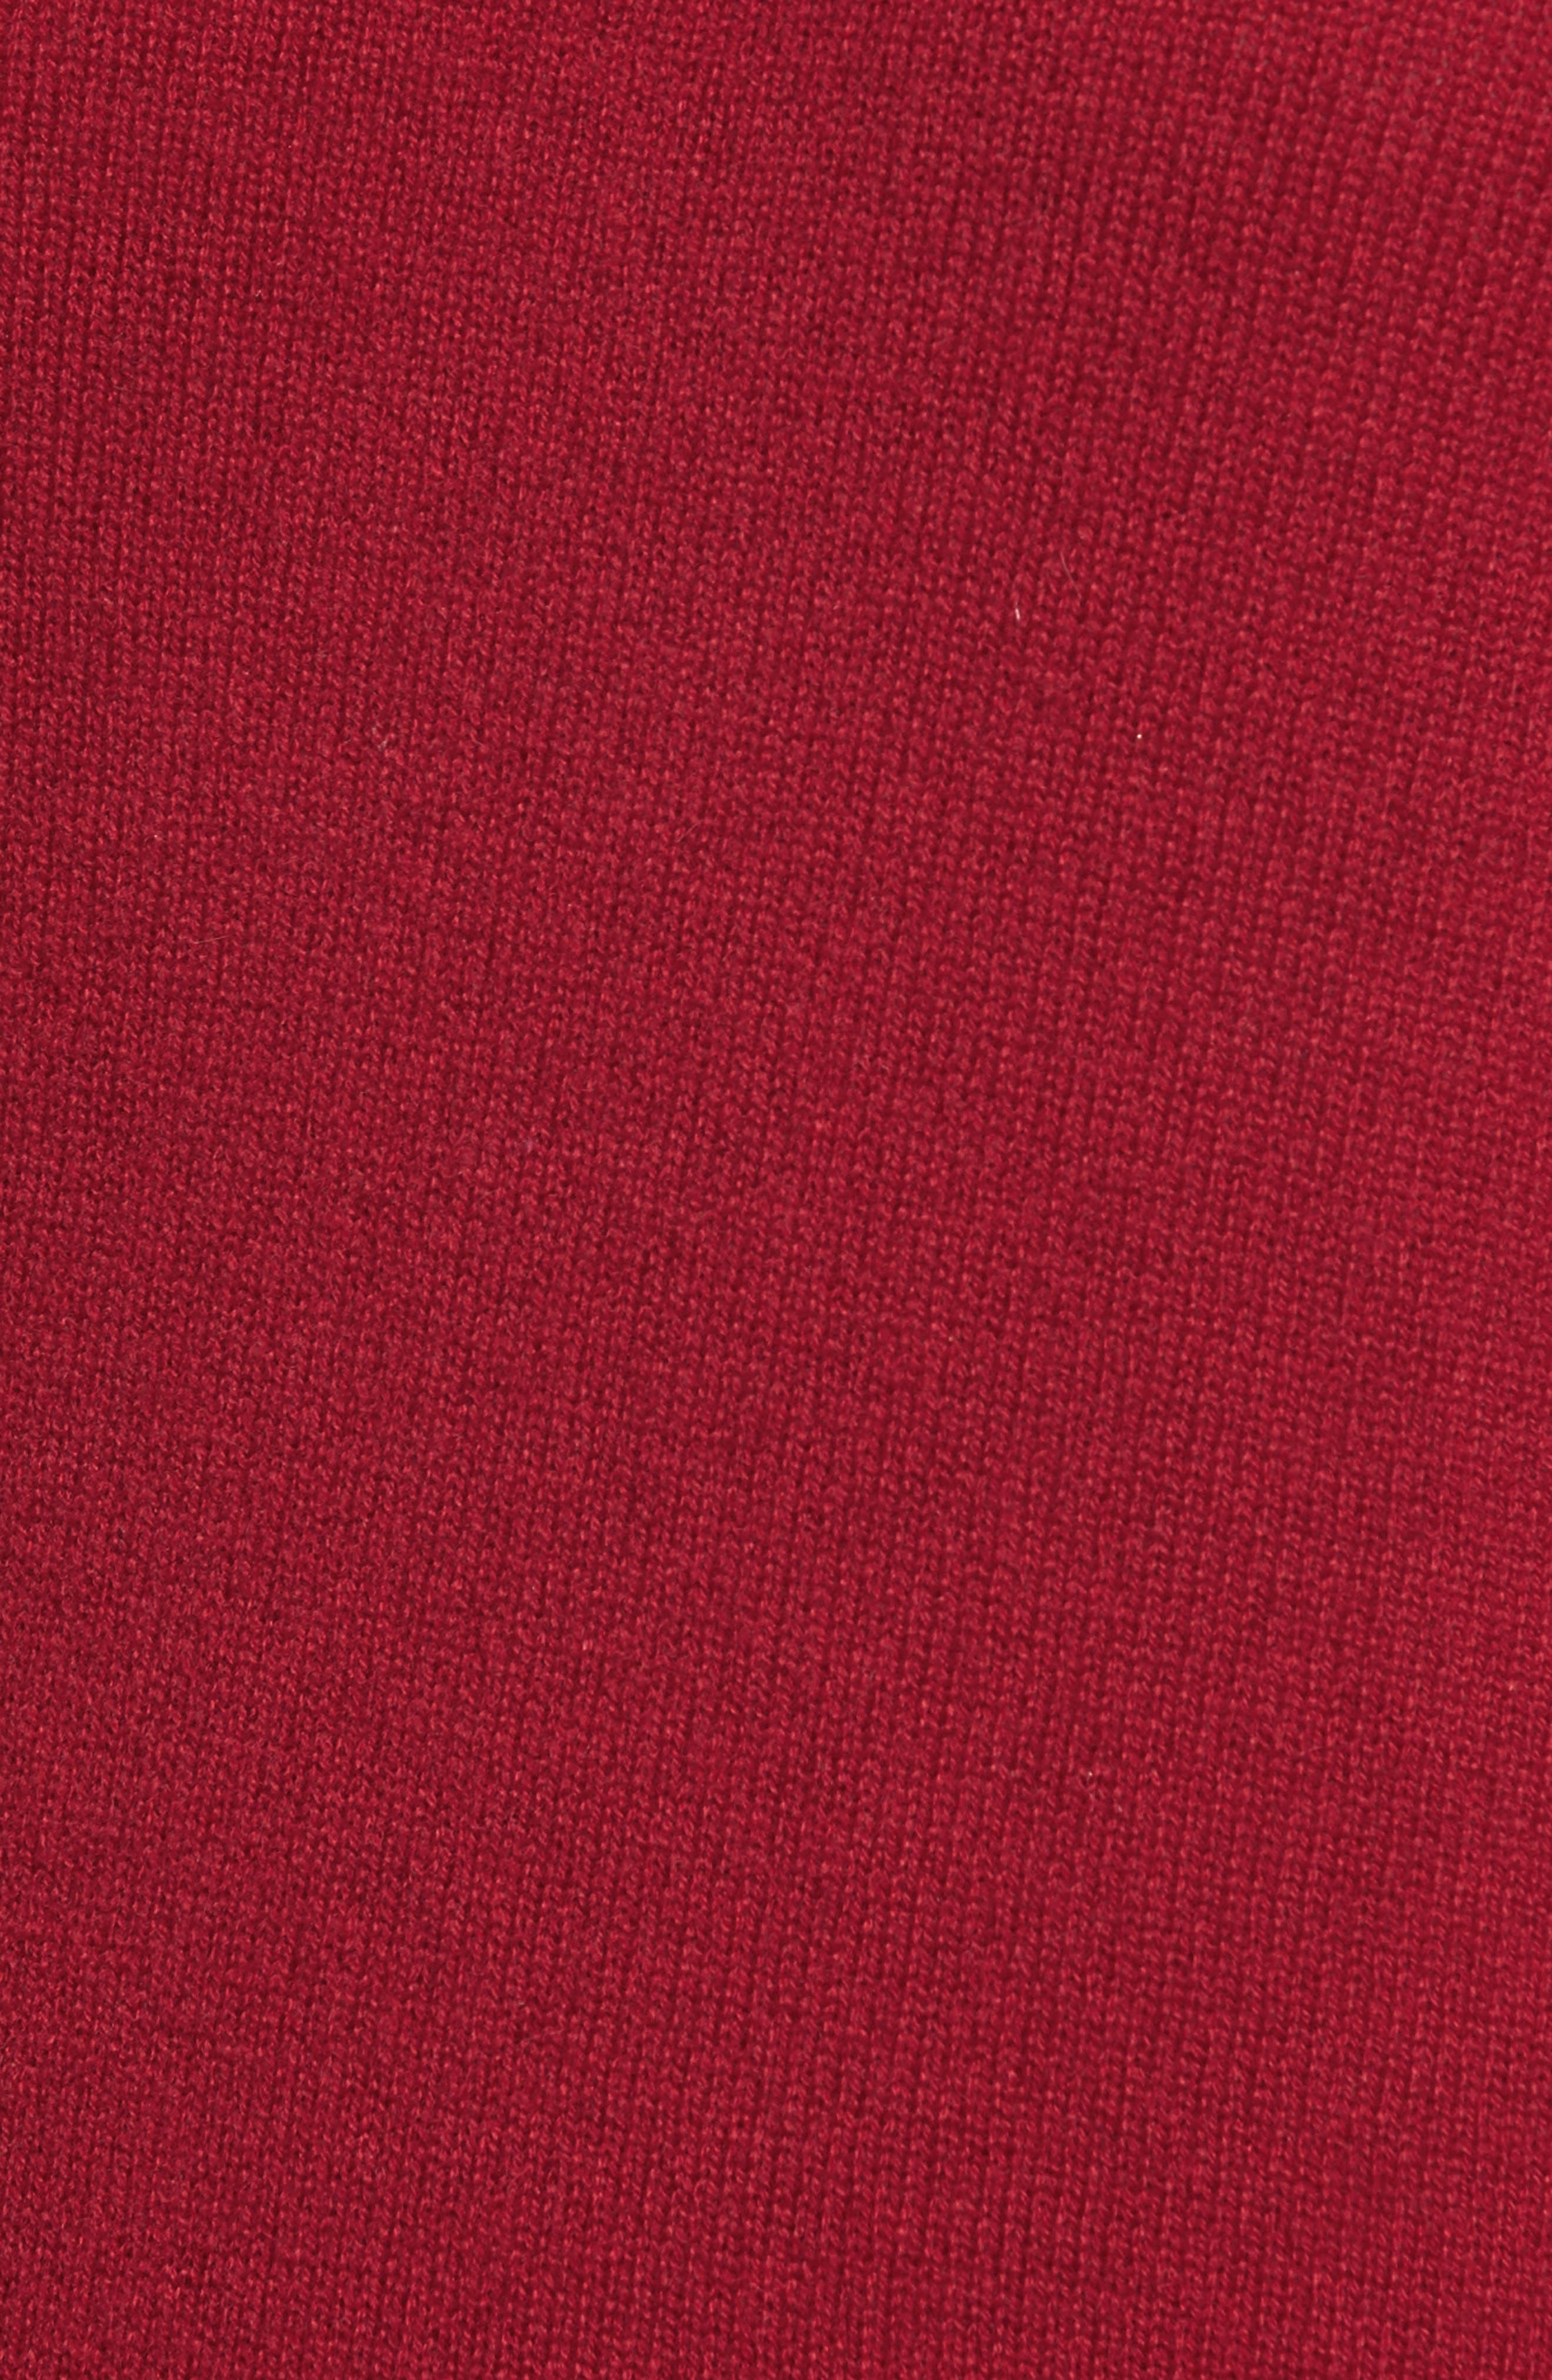 ,                             V-Neck Cashmere Sweater,                             Alternate thumbnail 96, color,                             601